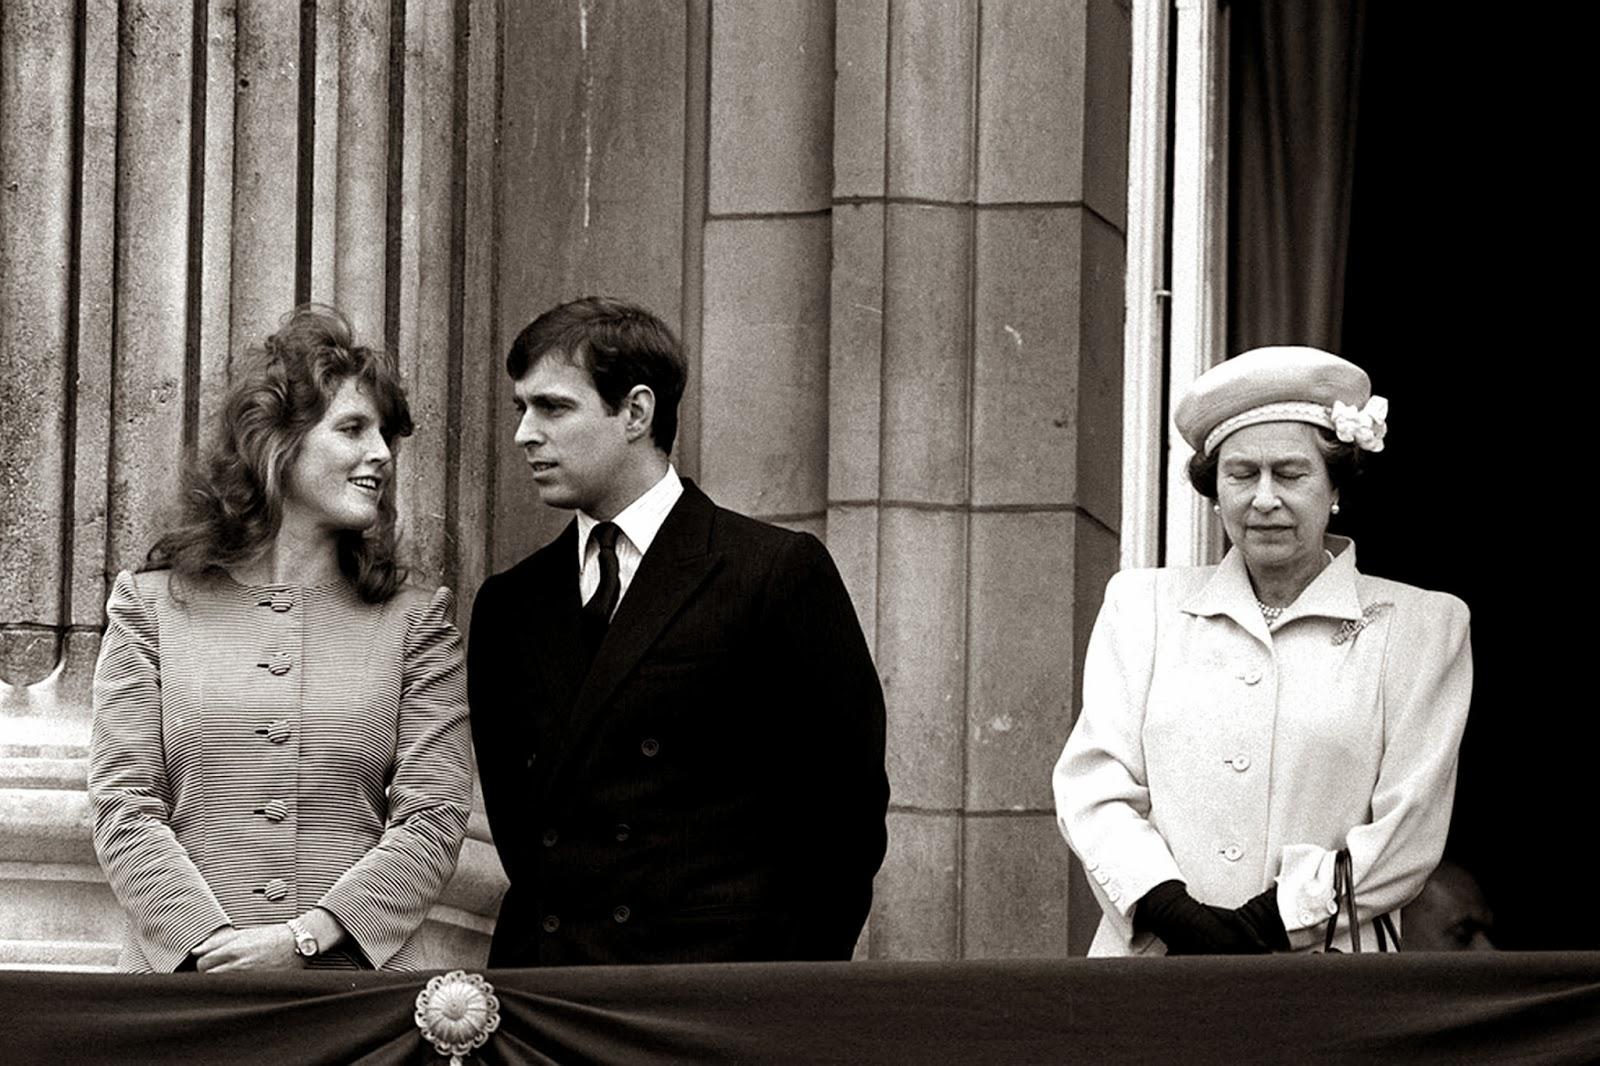 Royalty pomp 11 02 13 for Queen elizabeth balcony